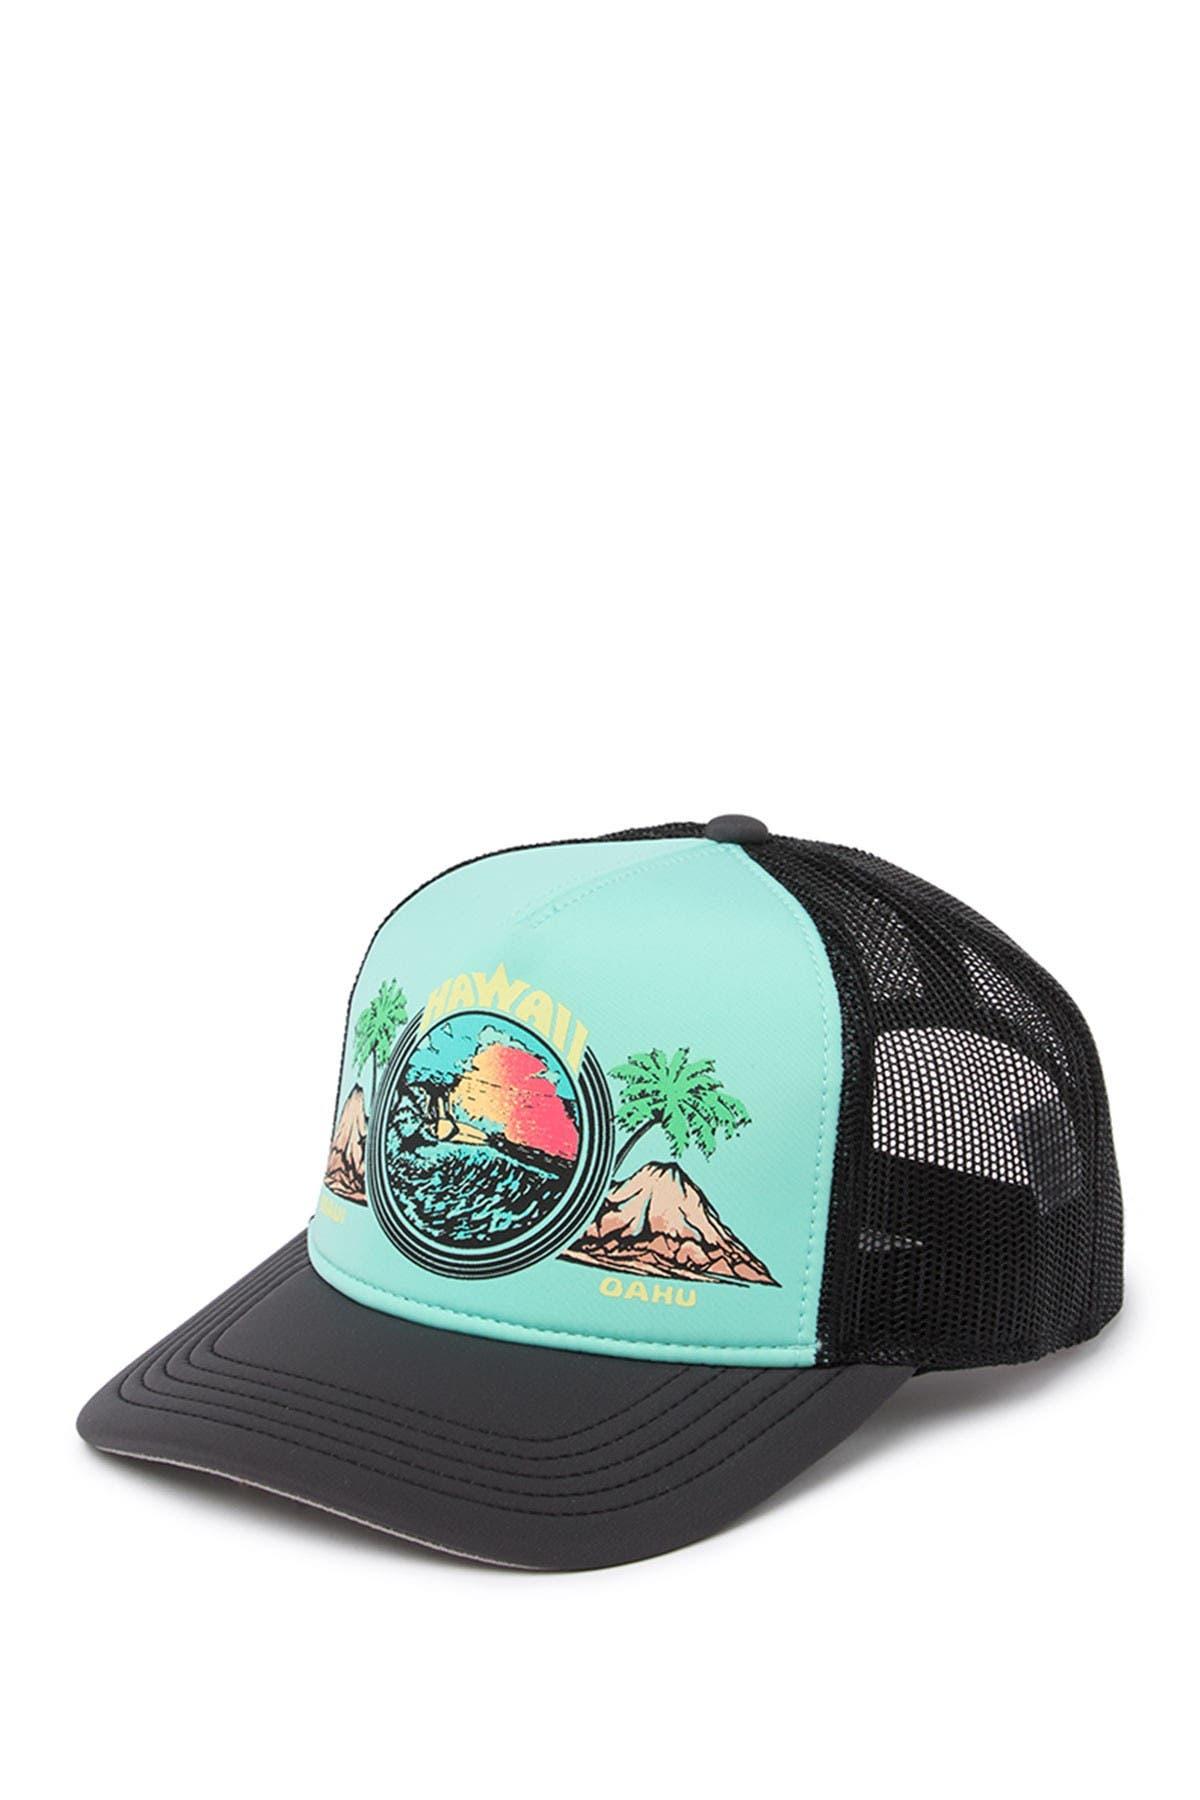 Image of American Needle Hawaiian Riptide Trucker Hat